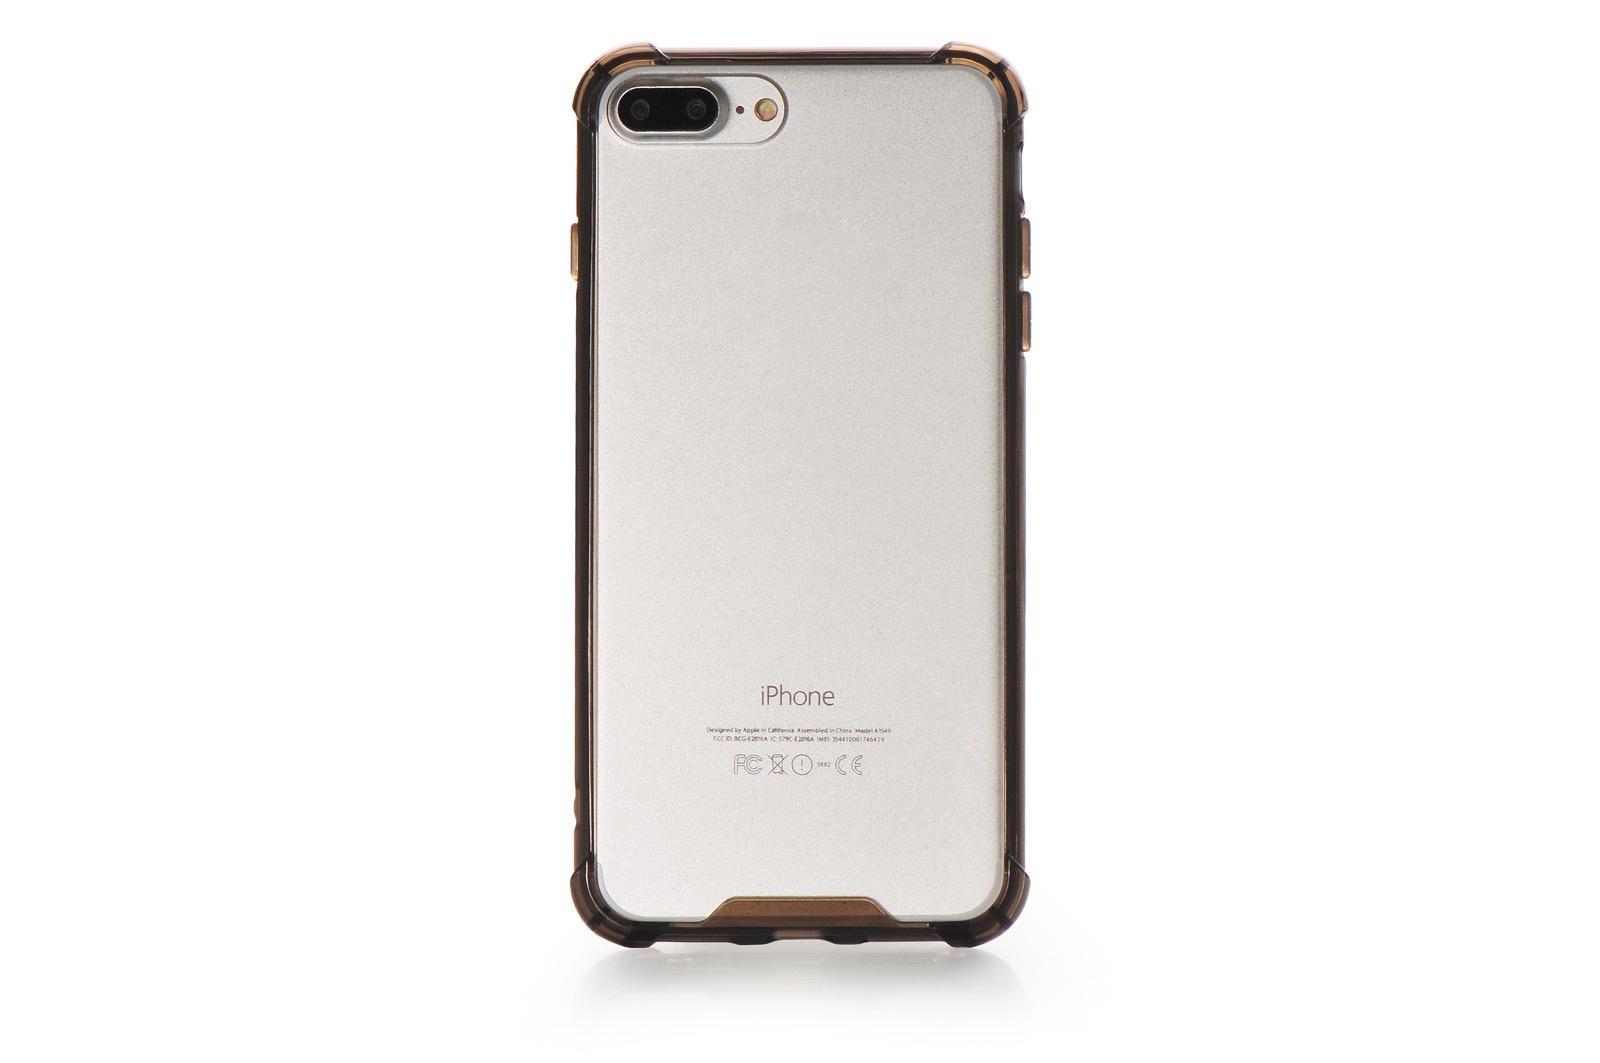 Чехол для сотового телефона Gurdini Чехол накладка Gurdini iPhone 7/8 Plus Lims 3 противоударный, 900595, прозрачный